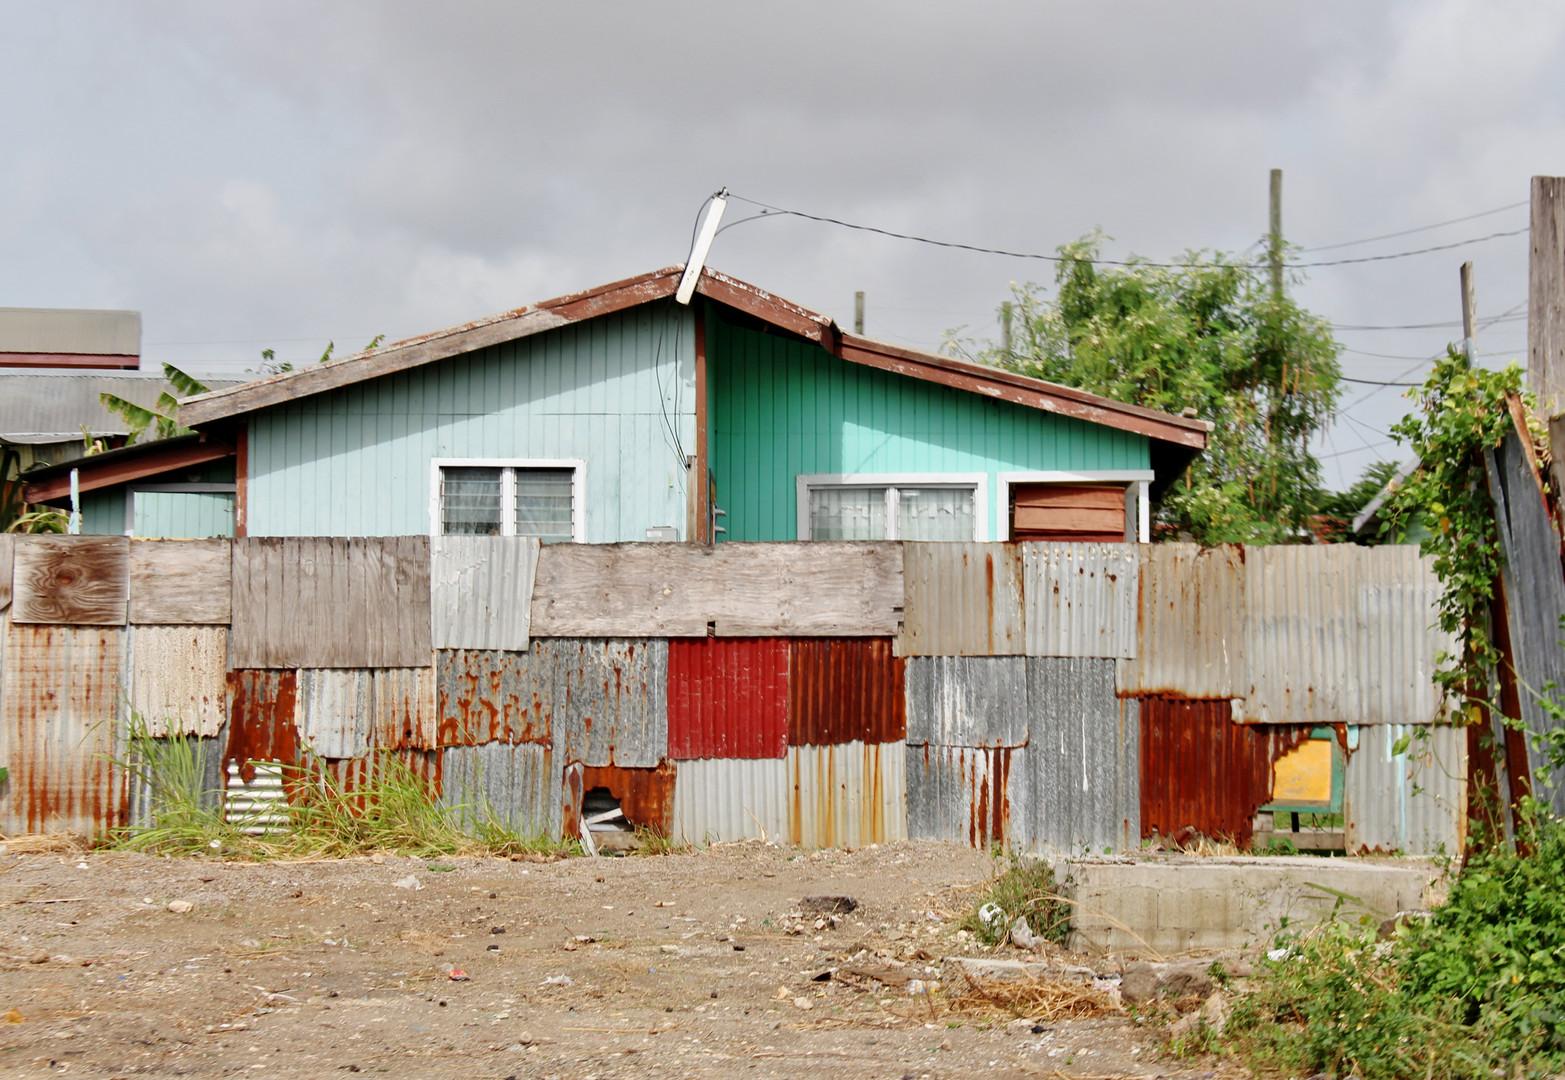 Antigua - Rusty walls